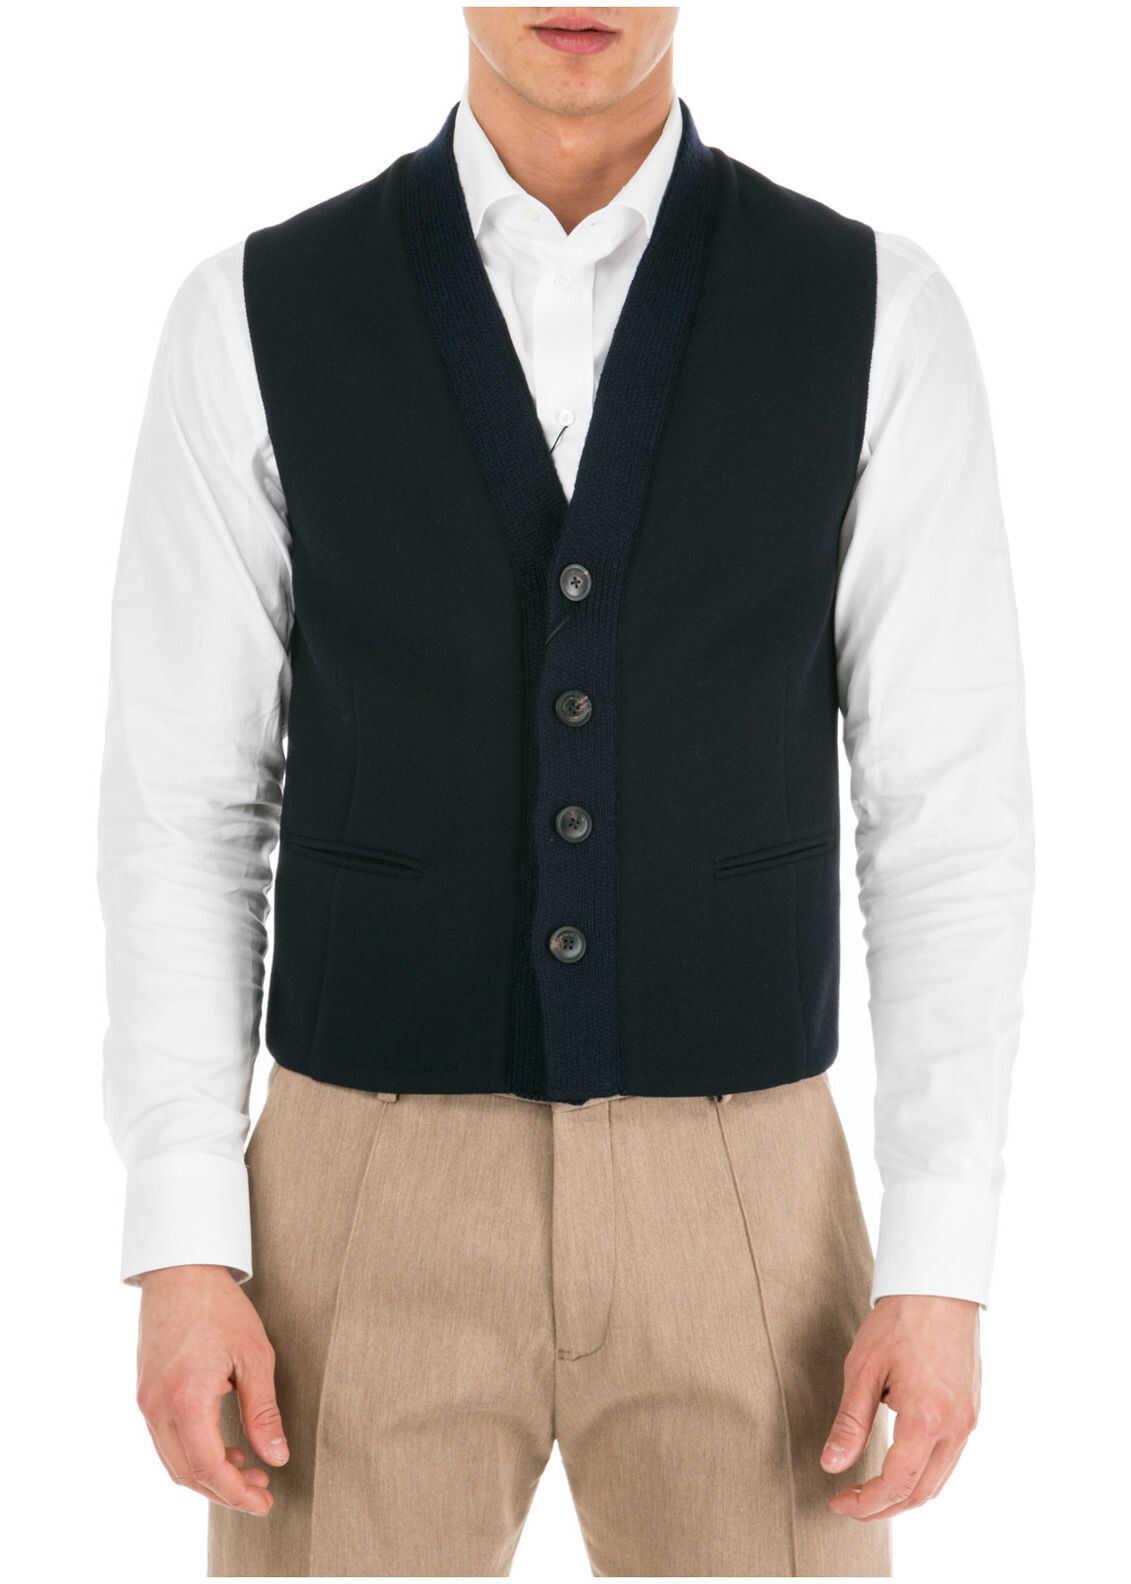 Emporio Armani Waistcoat Vest Blue